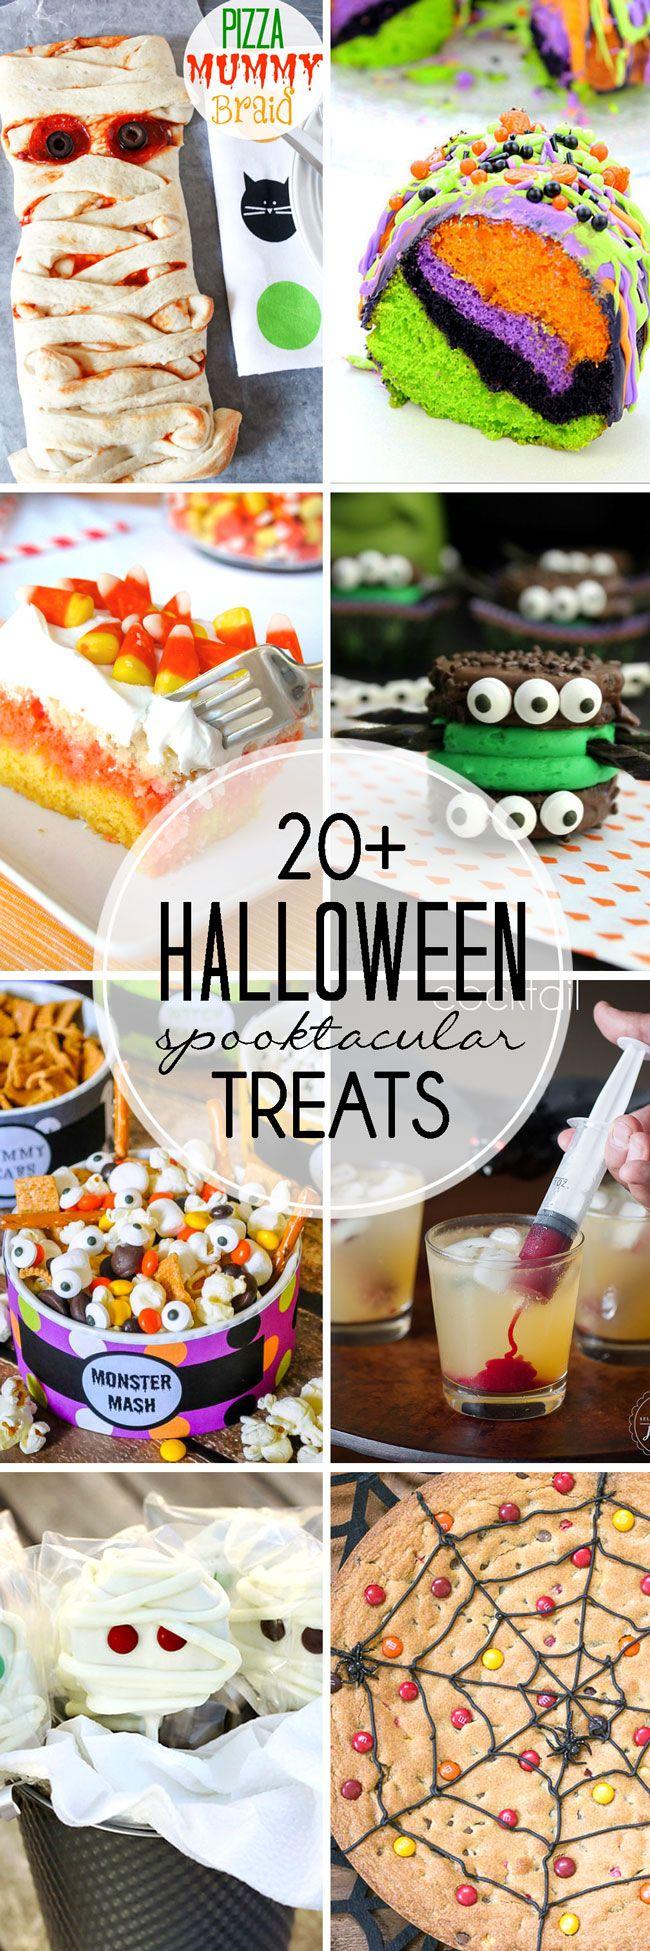 30 spooktacular halloween party recipes food network uk satukisfo 30 spooktacular halloween party recipes food network uk forumfinder Gallery